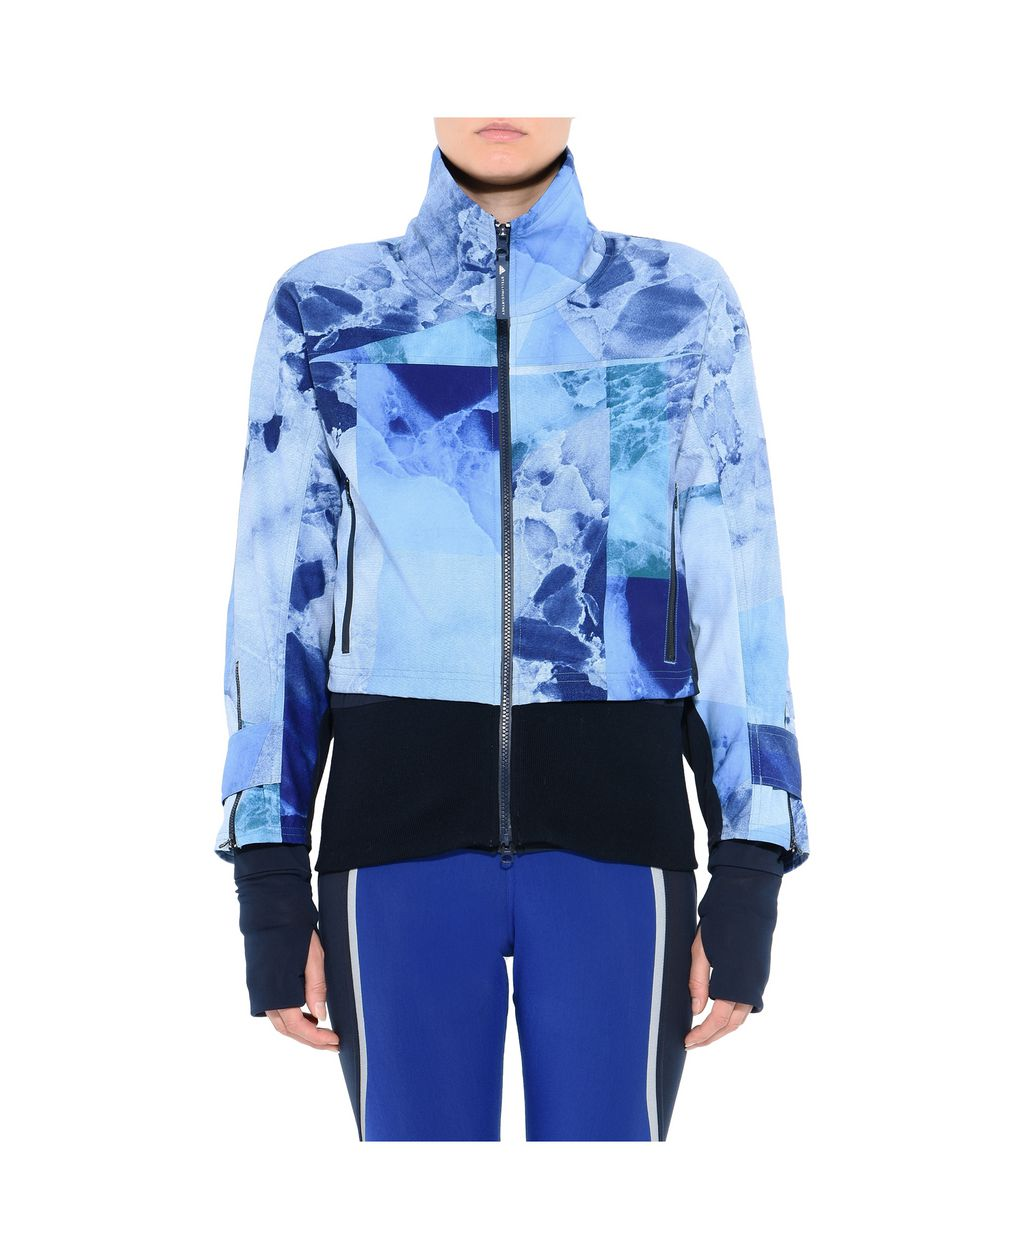 Blue Print Running Jacket - ADIDAS by STELLA McCARTNEY